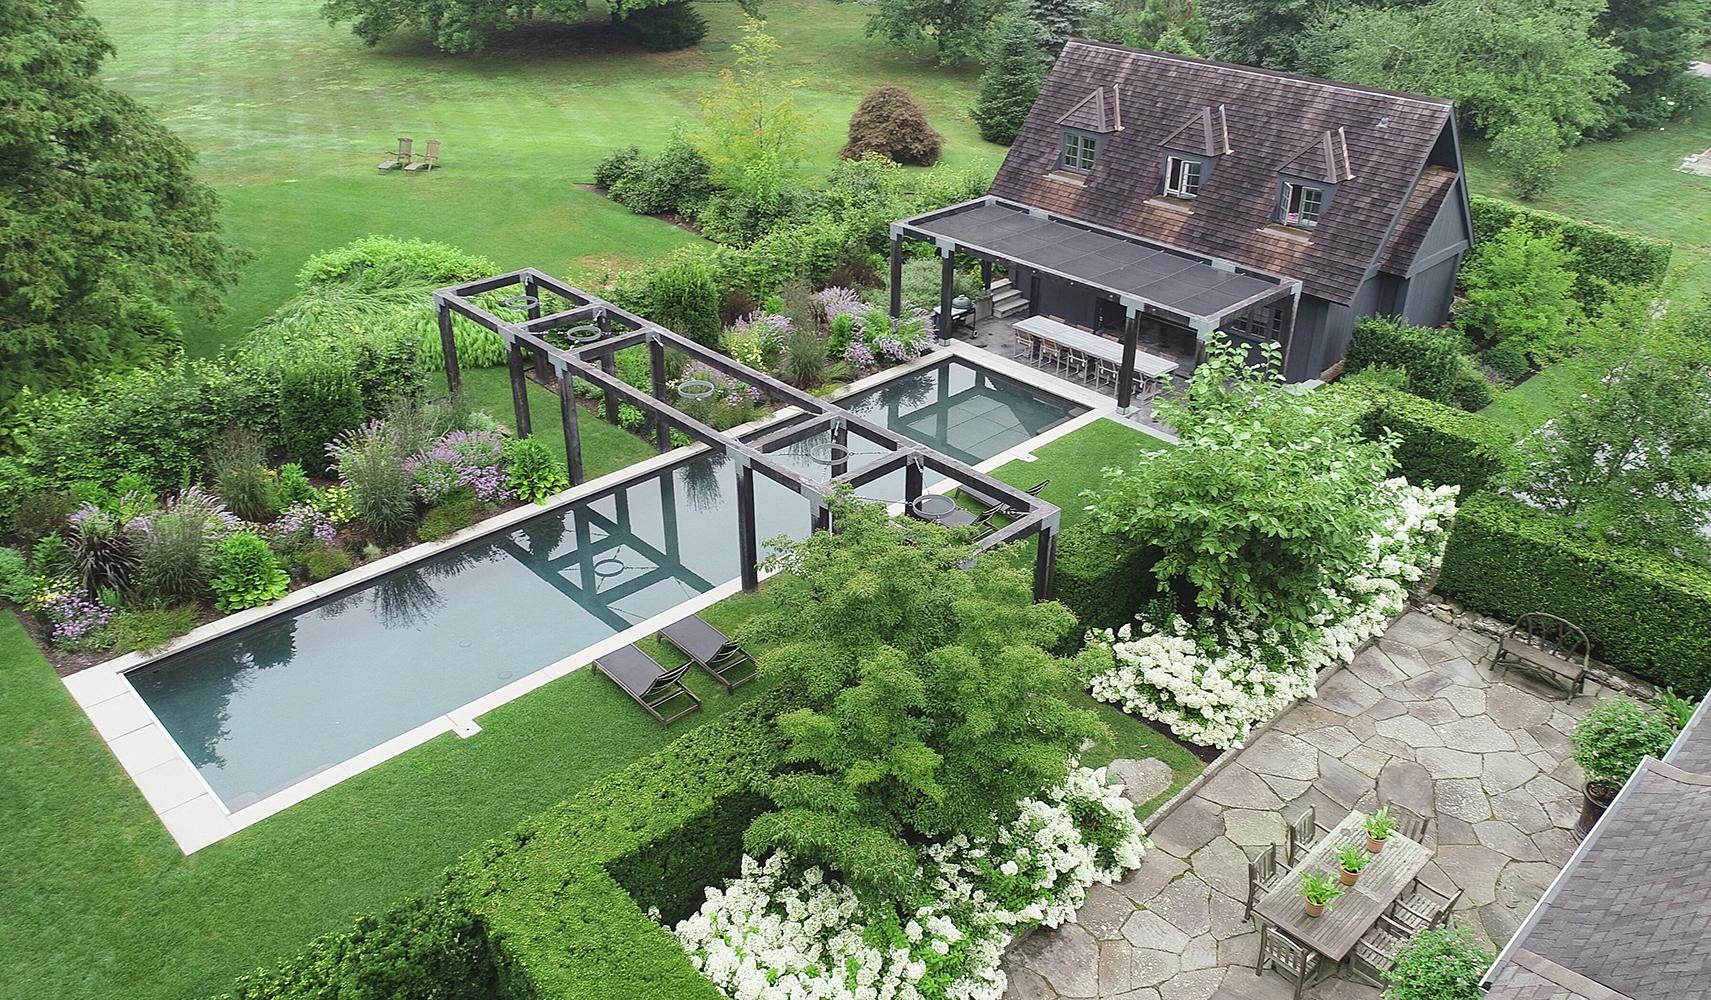 Rhode Island Garden: Woodland garden, pool, outdoor living areas with fire feature